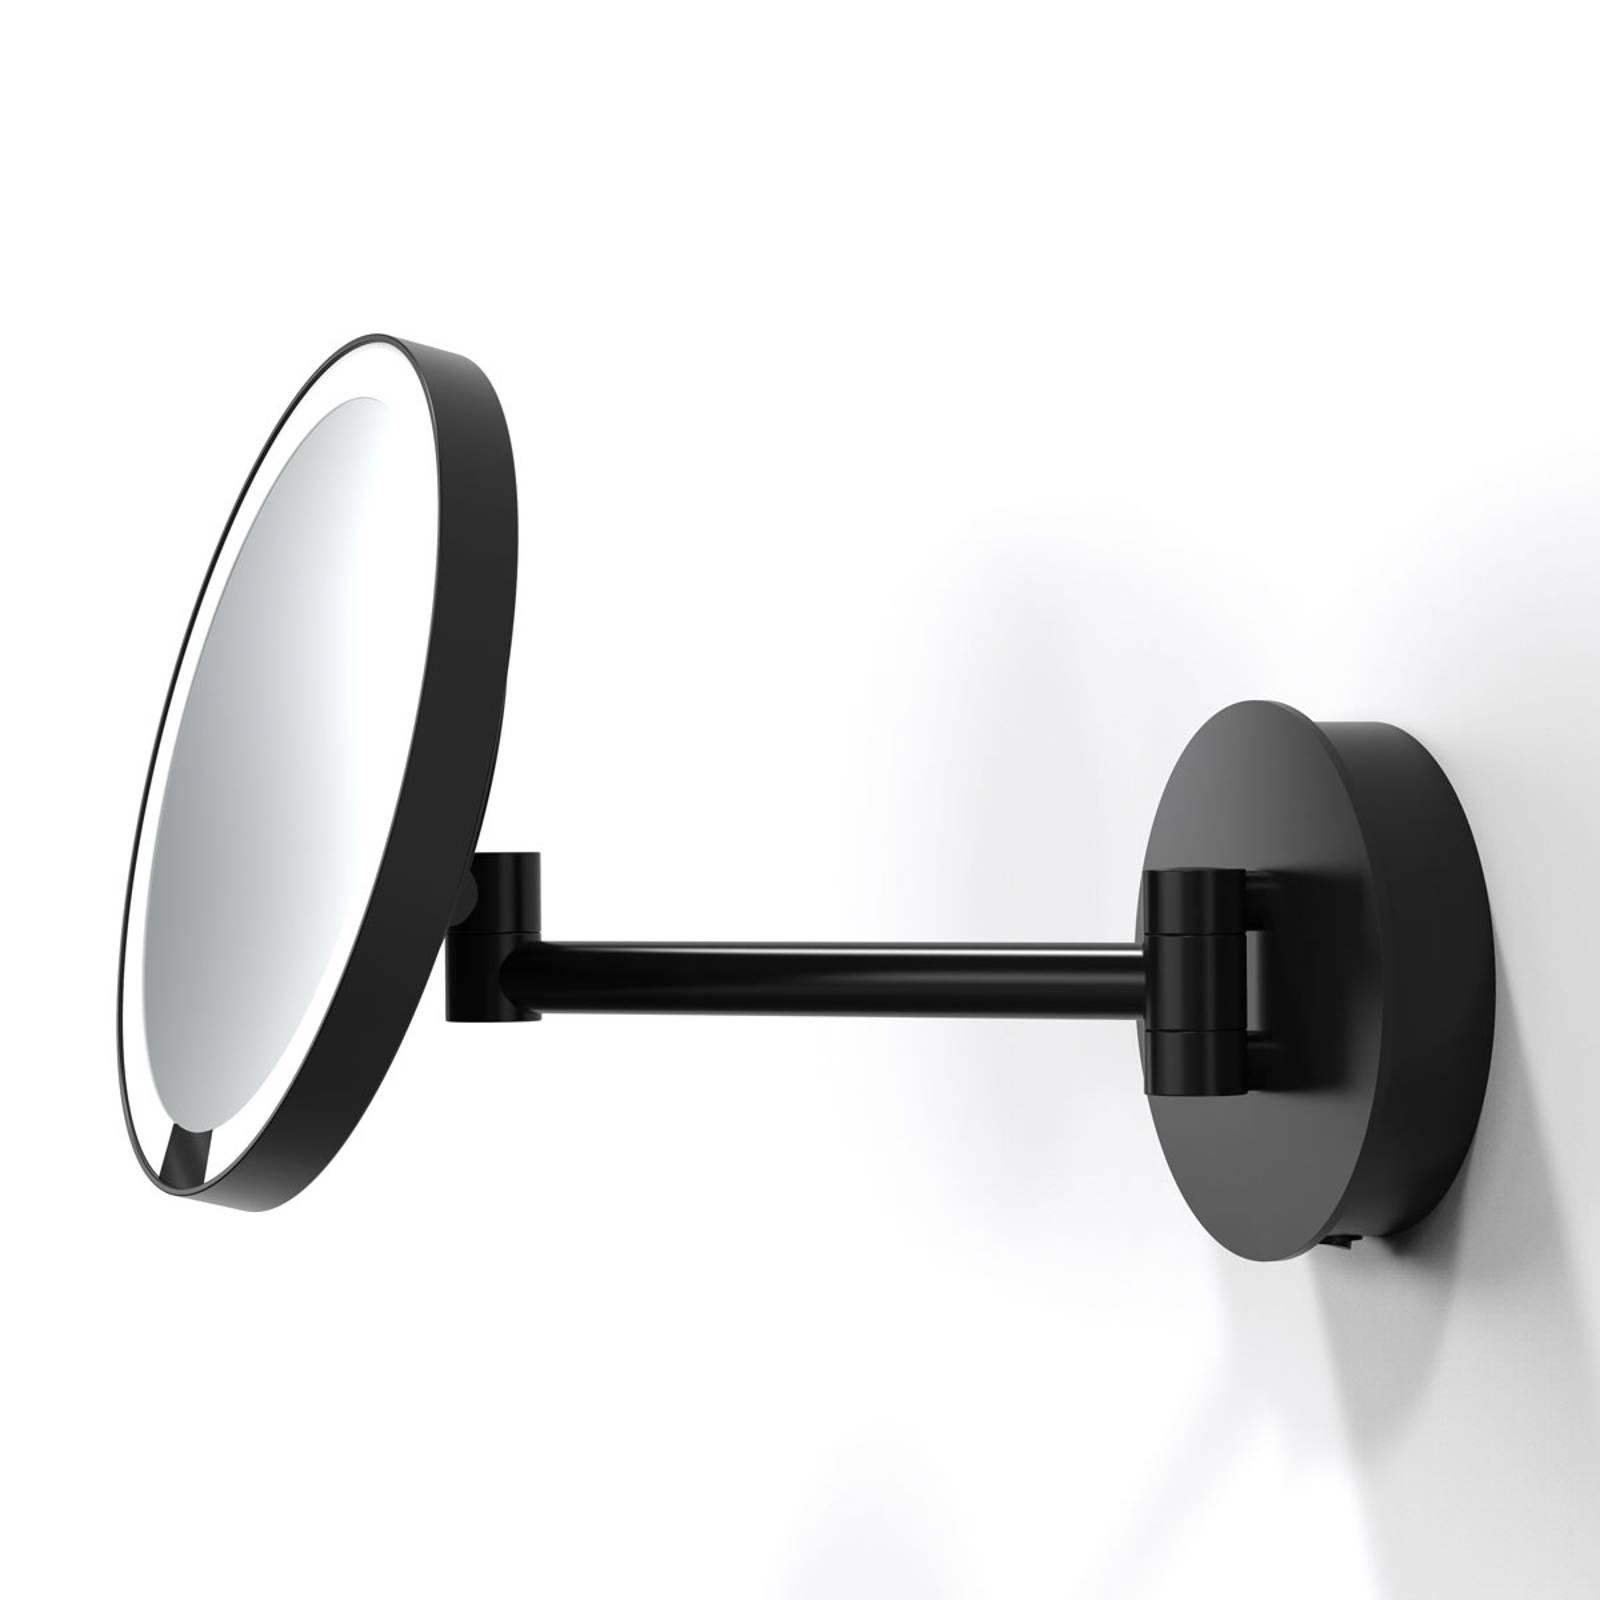 Decor Walther Just Look WR LED-seinäpeili musta